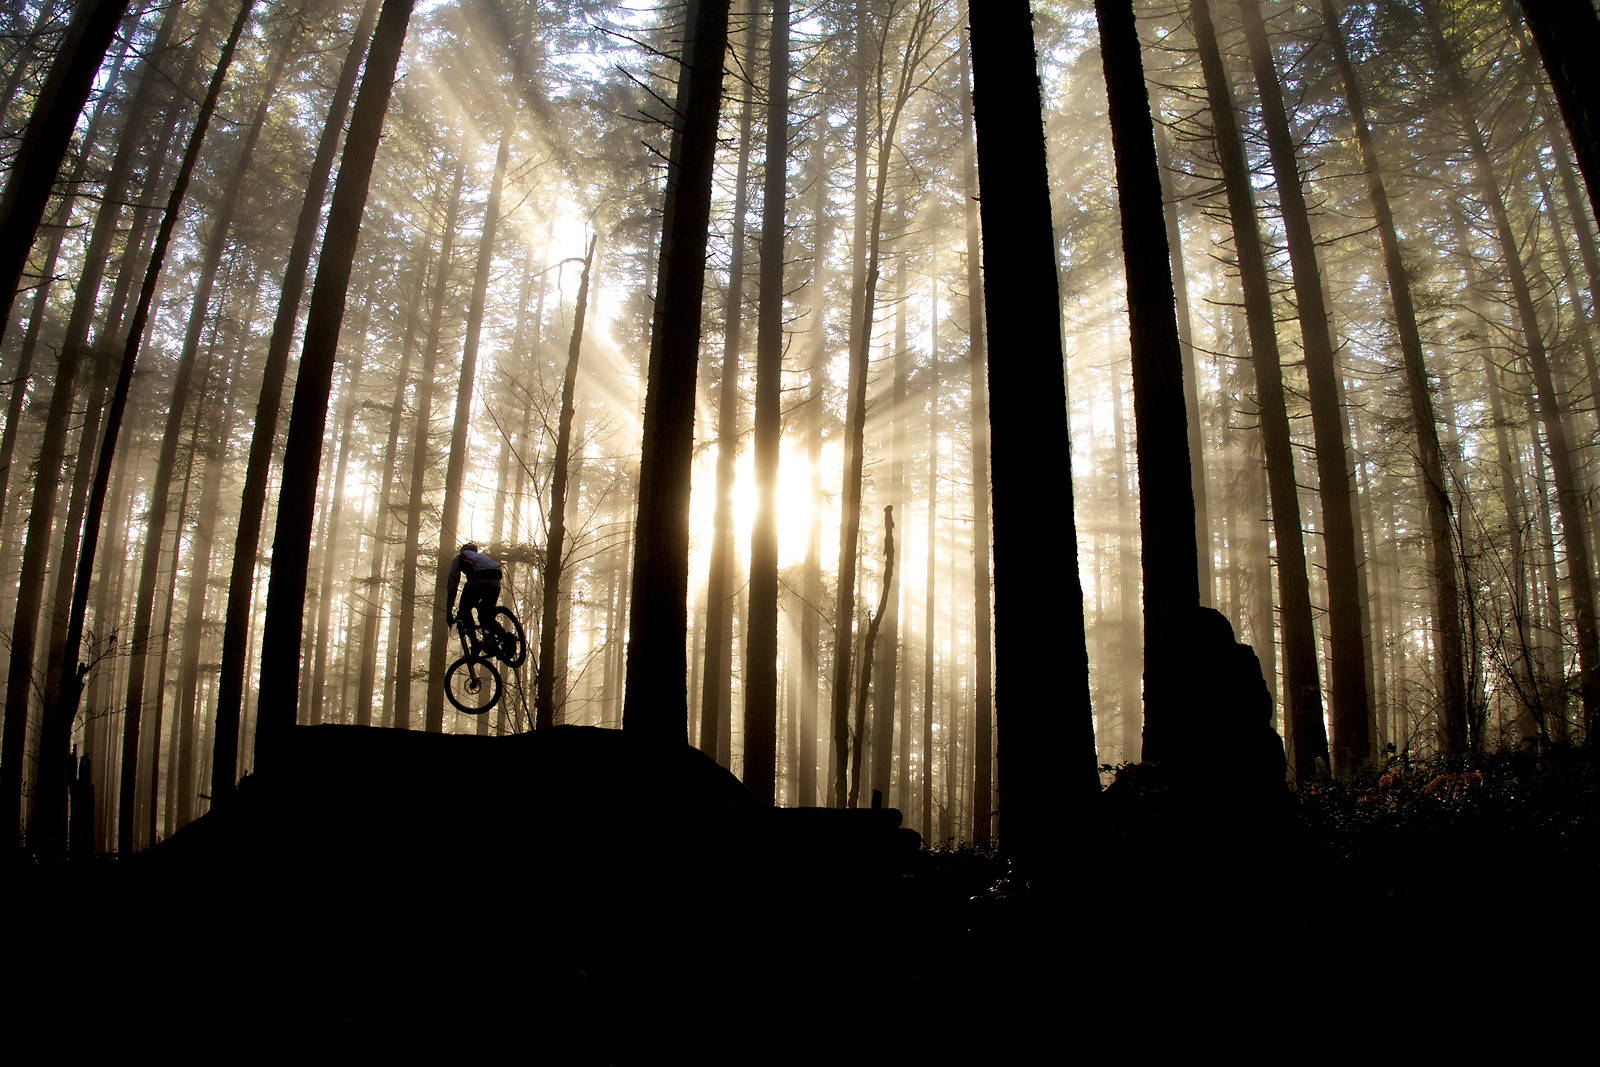 Lear Blackrock Tepper - corytepper.com - Mountain Biking Pictures - Vital MTB